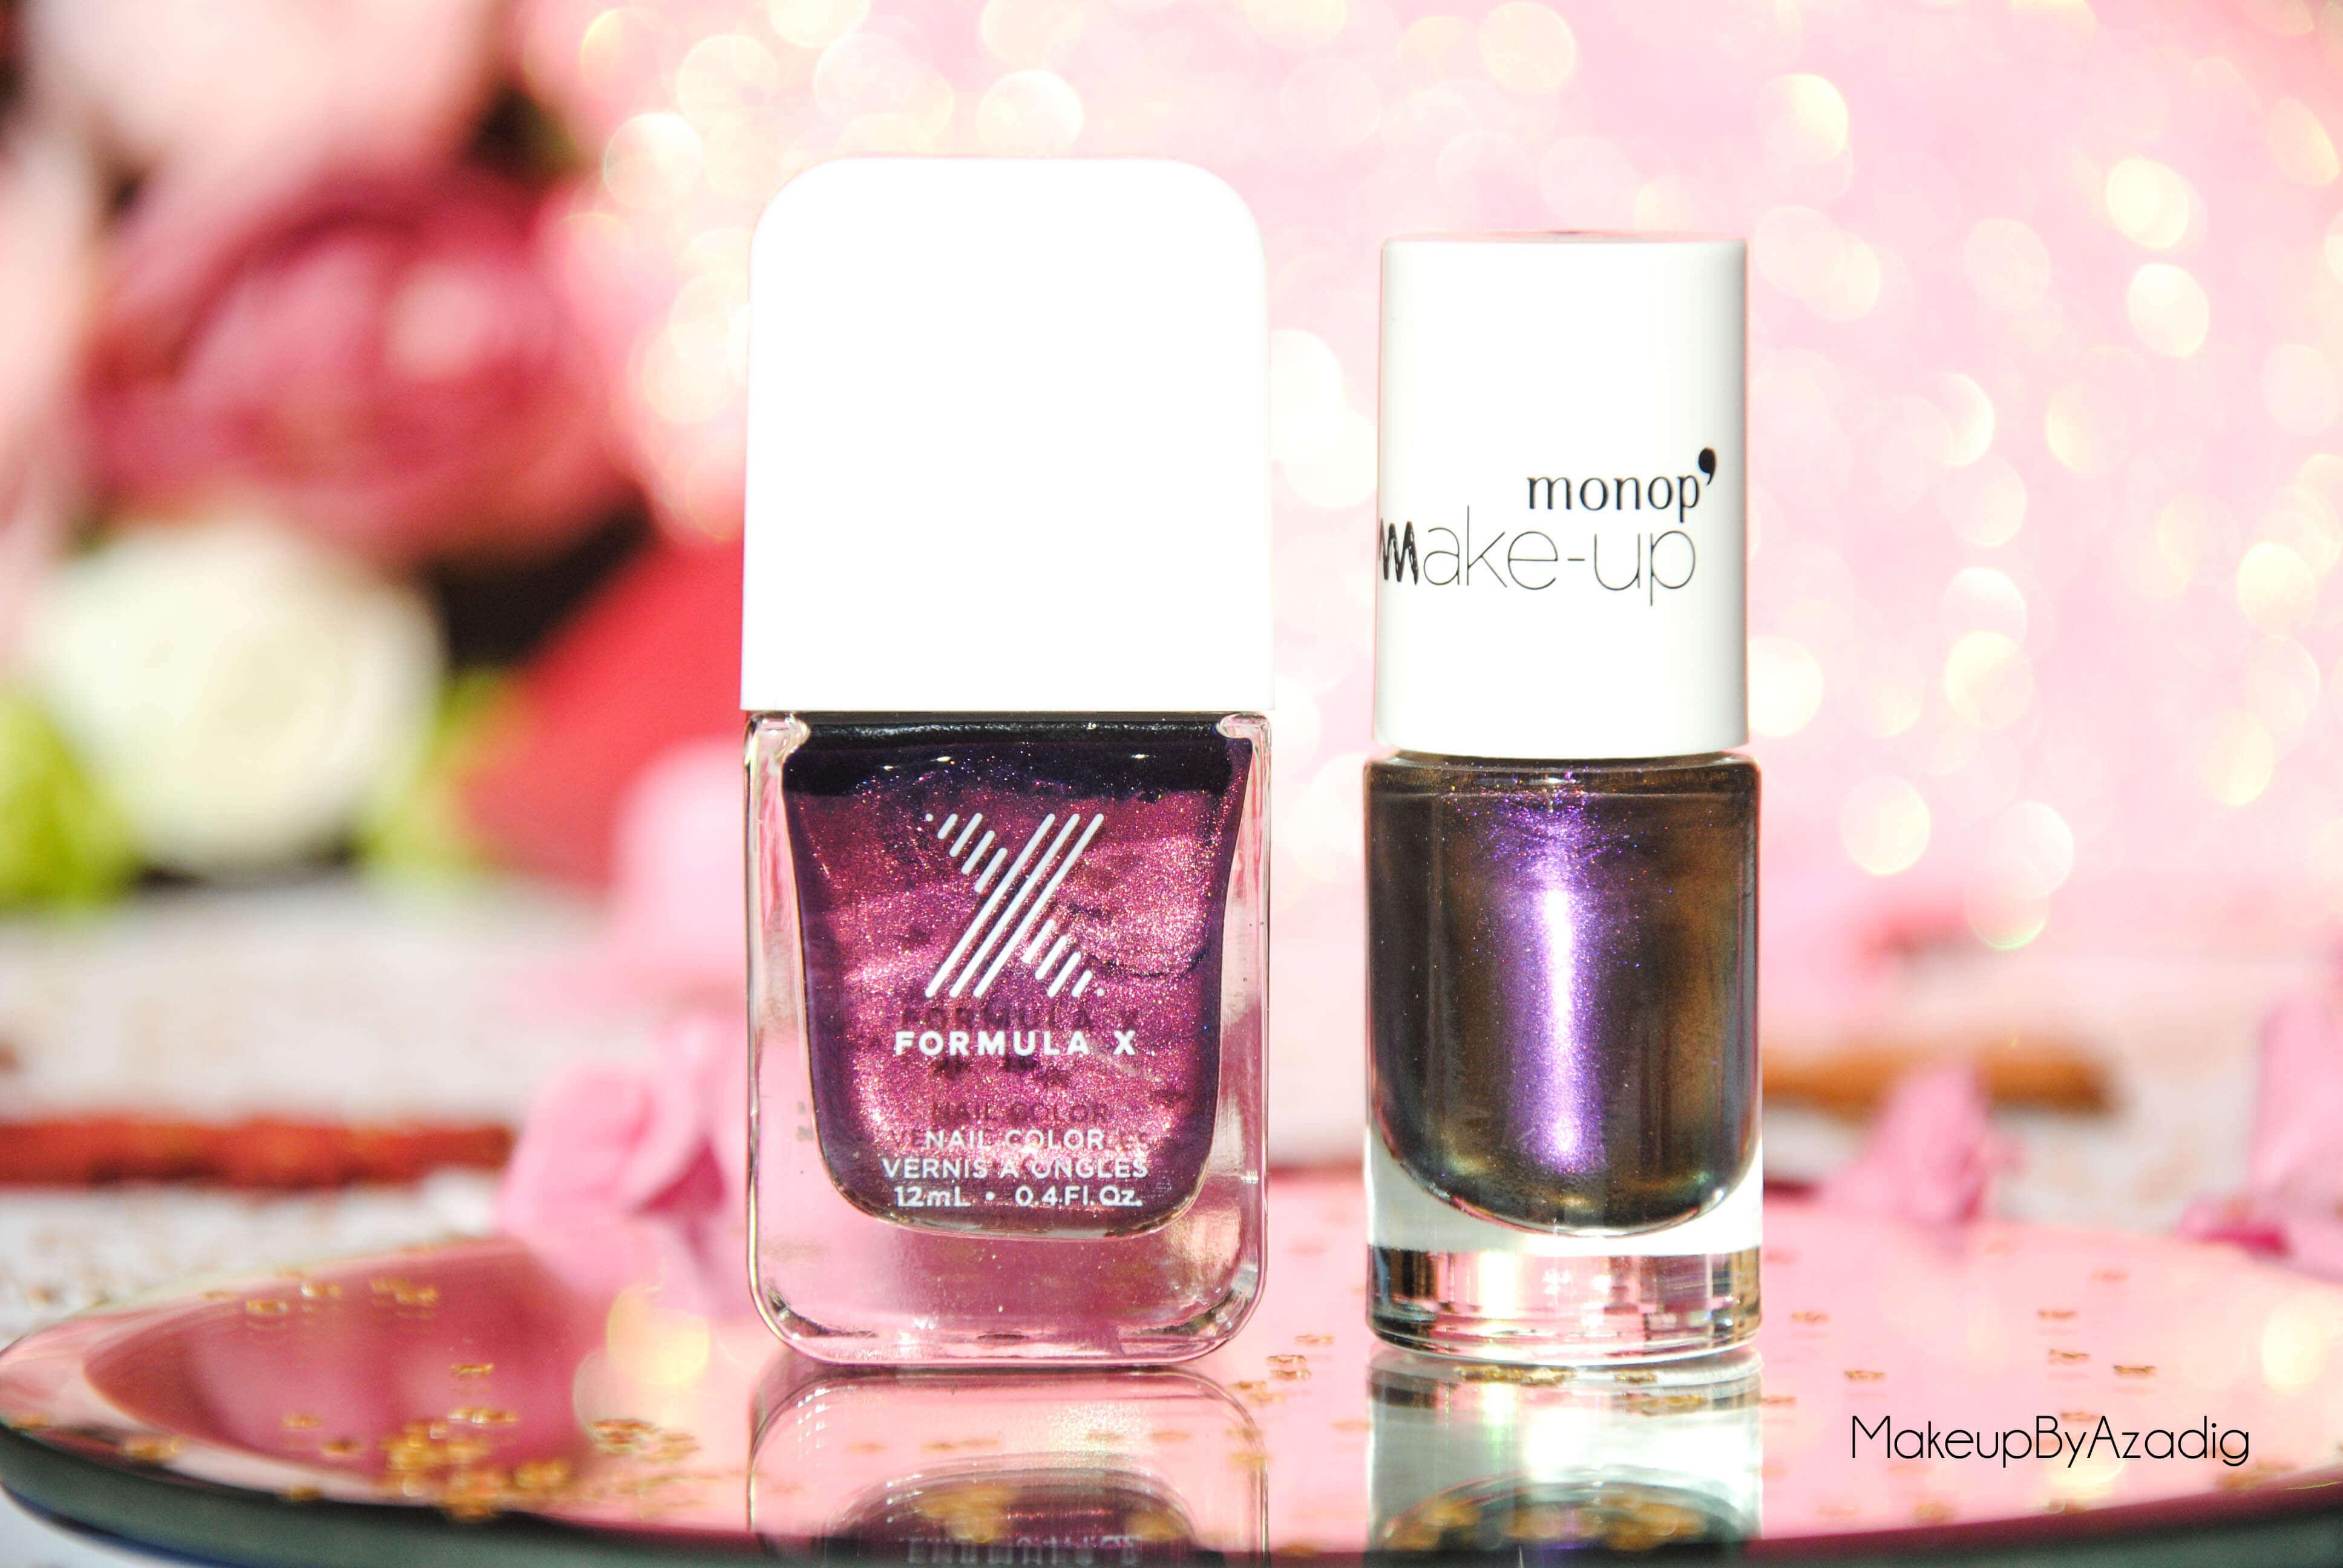 makeupbyazadig-vernis-tendance-automne-nails-autumn-formula-x-monop-makeup-troyes-dijon-paris-sandrea26france-camaieu-opi-kiko-sephora-mavala-essie-infinite